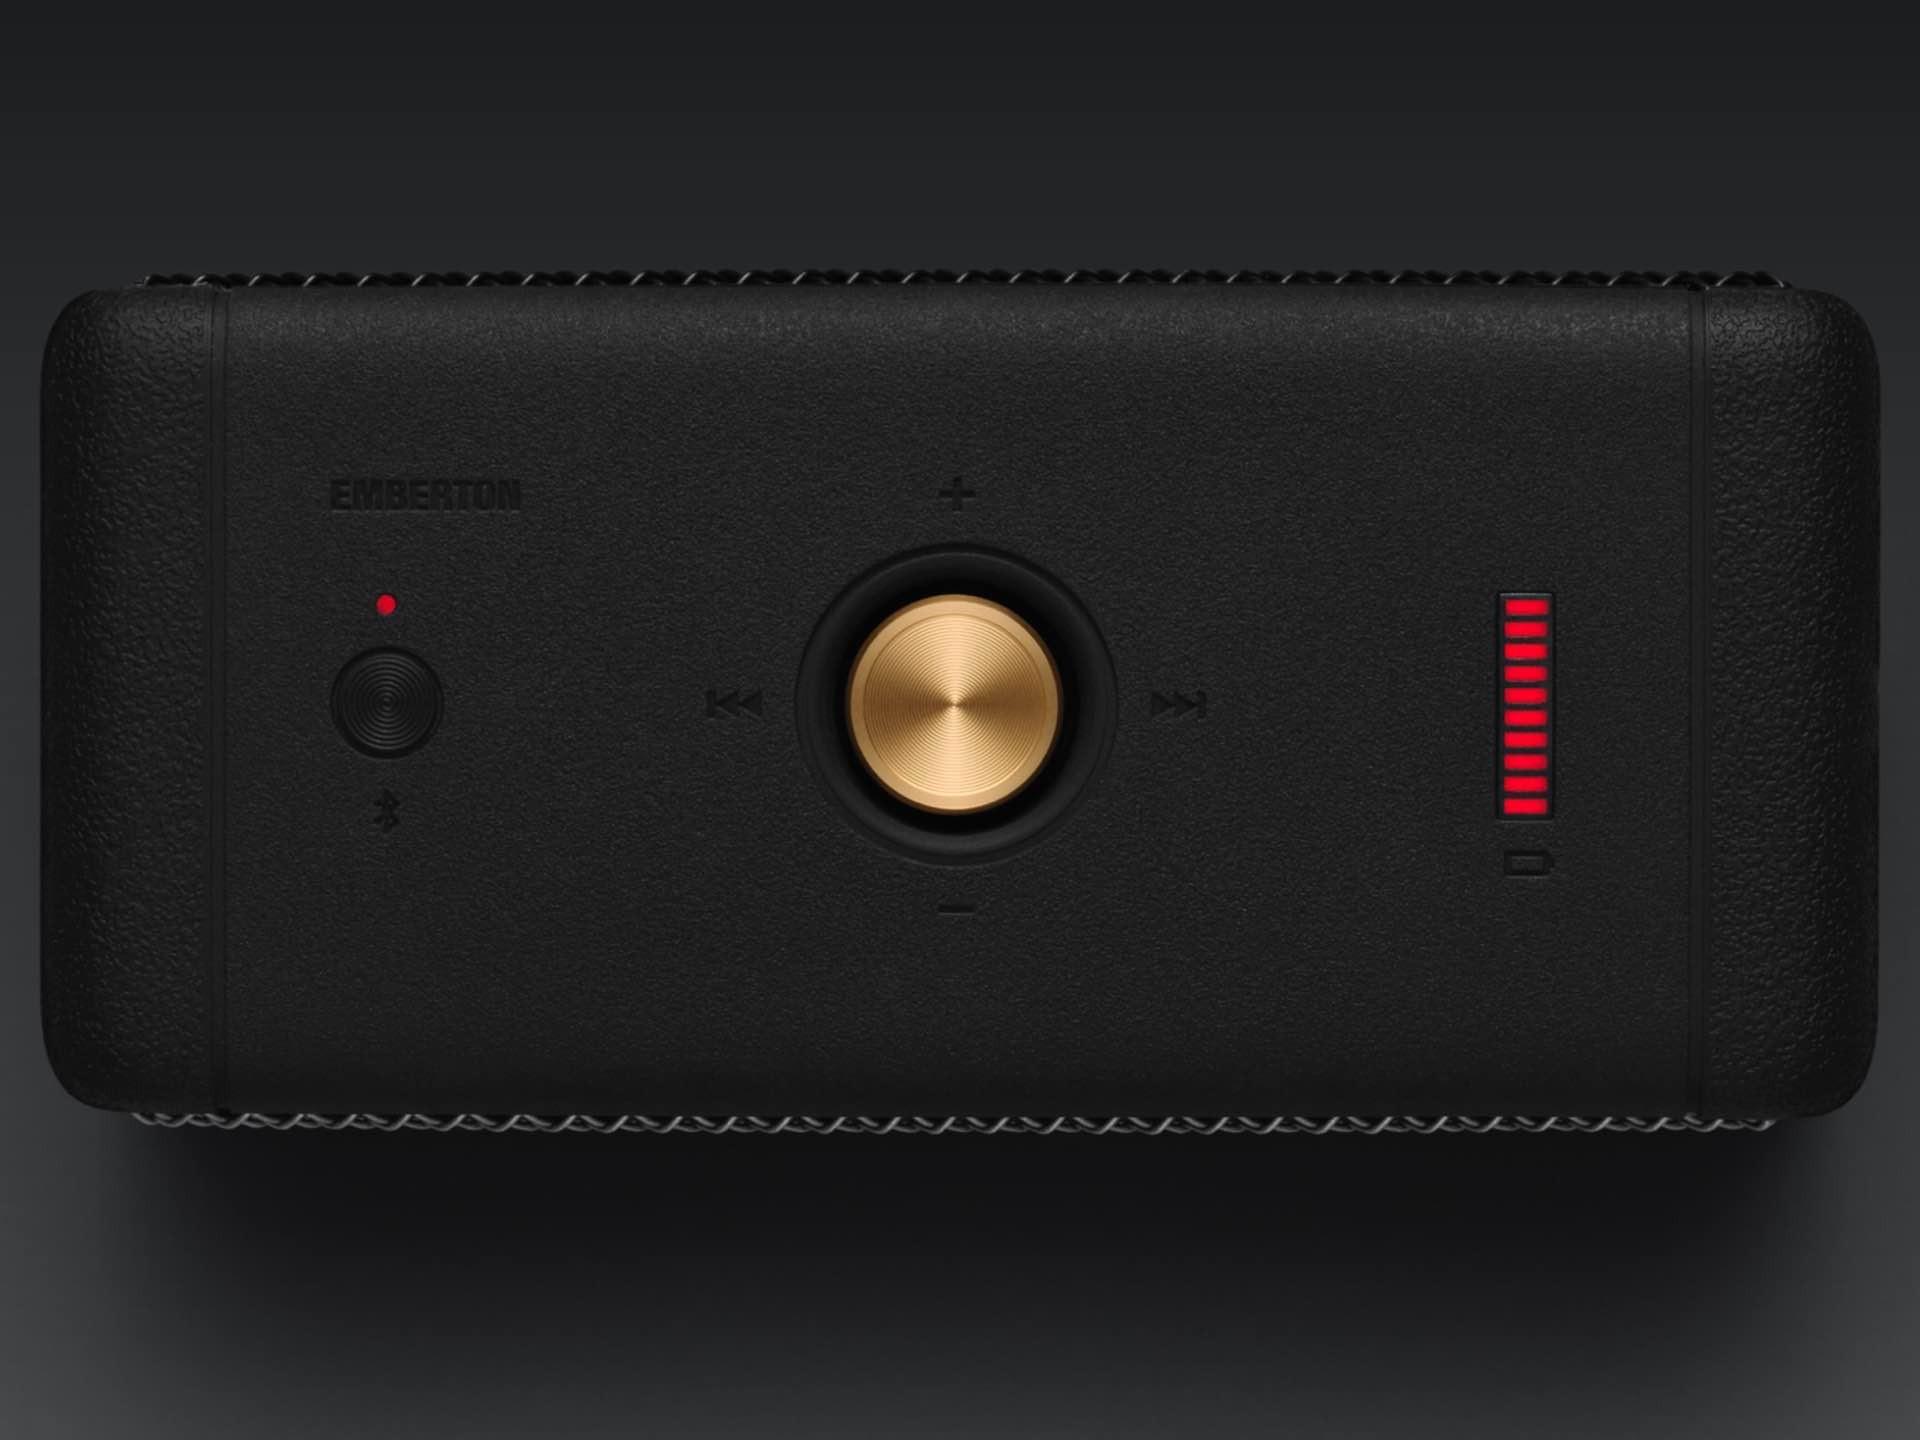 marshall-emberton-portable-bluetooth-speaker-control-joystick